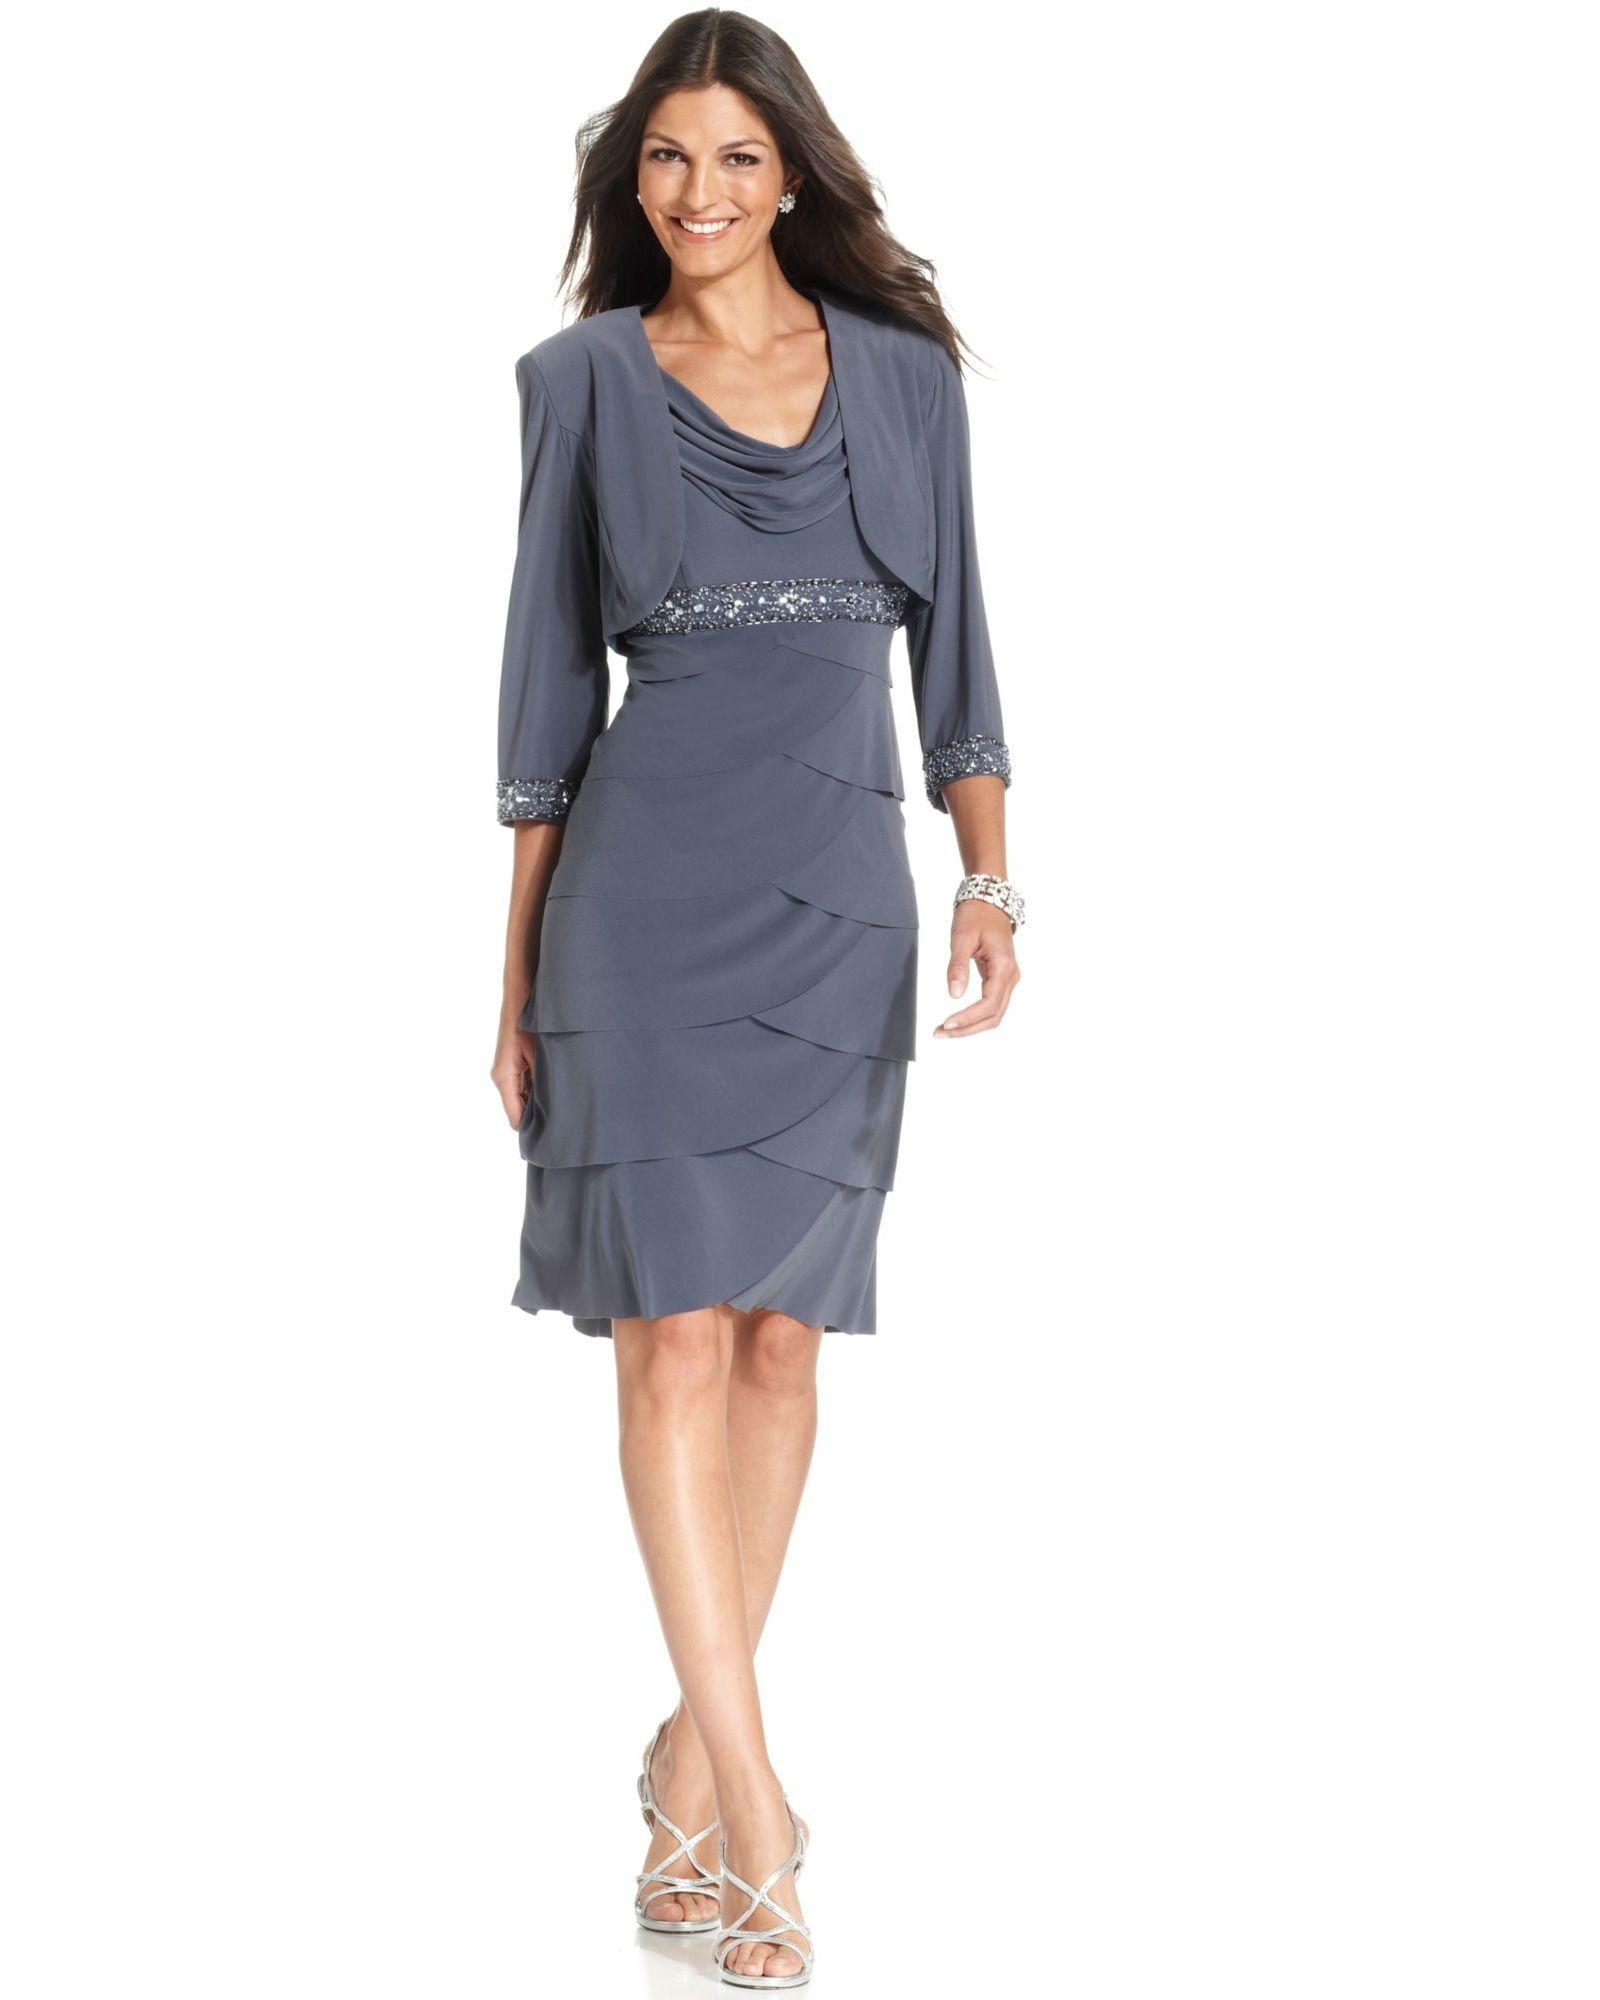 Beaded Cowl Neck Dress